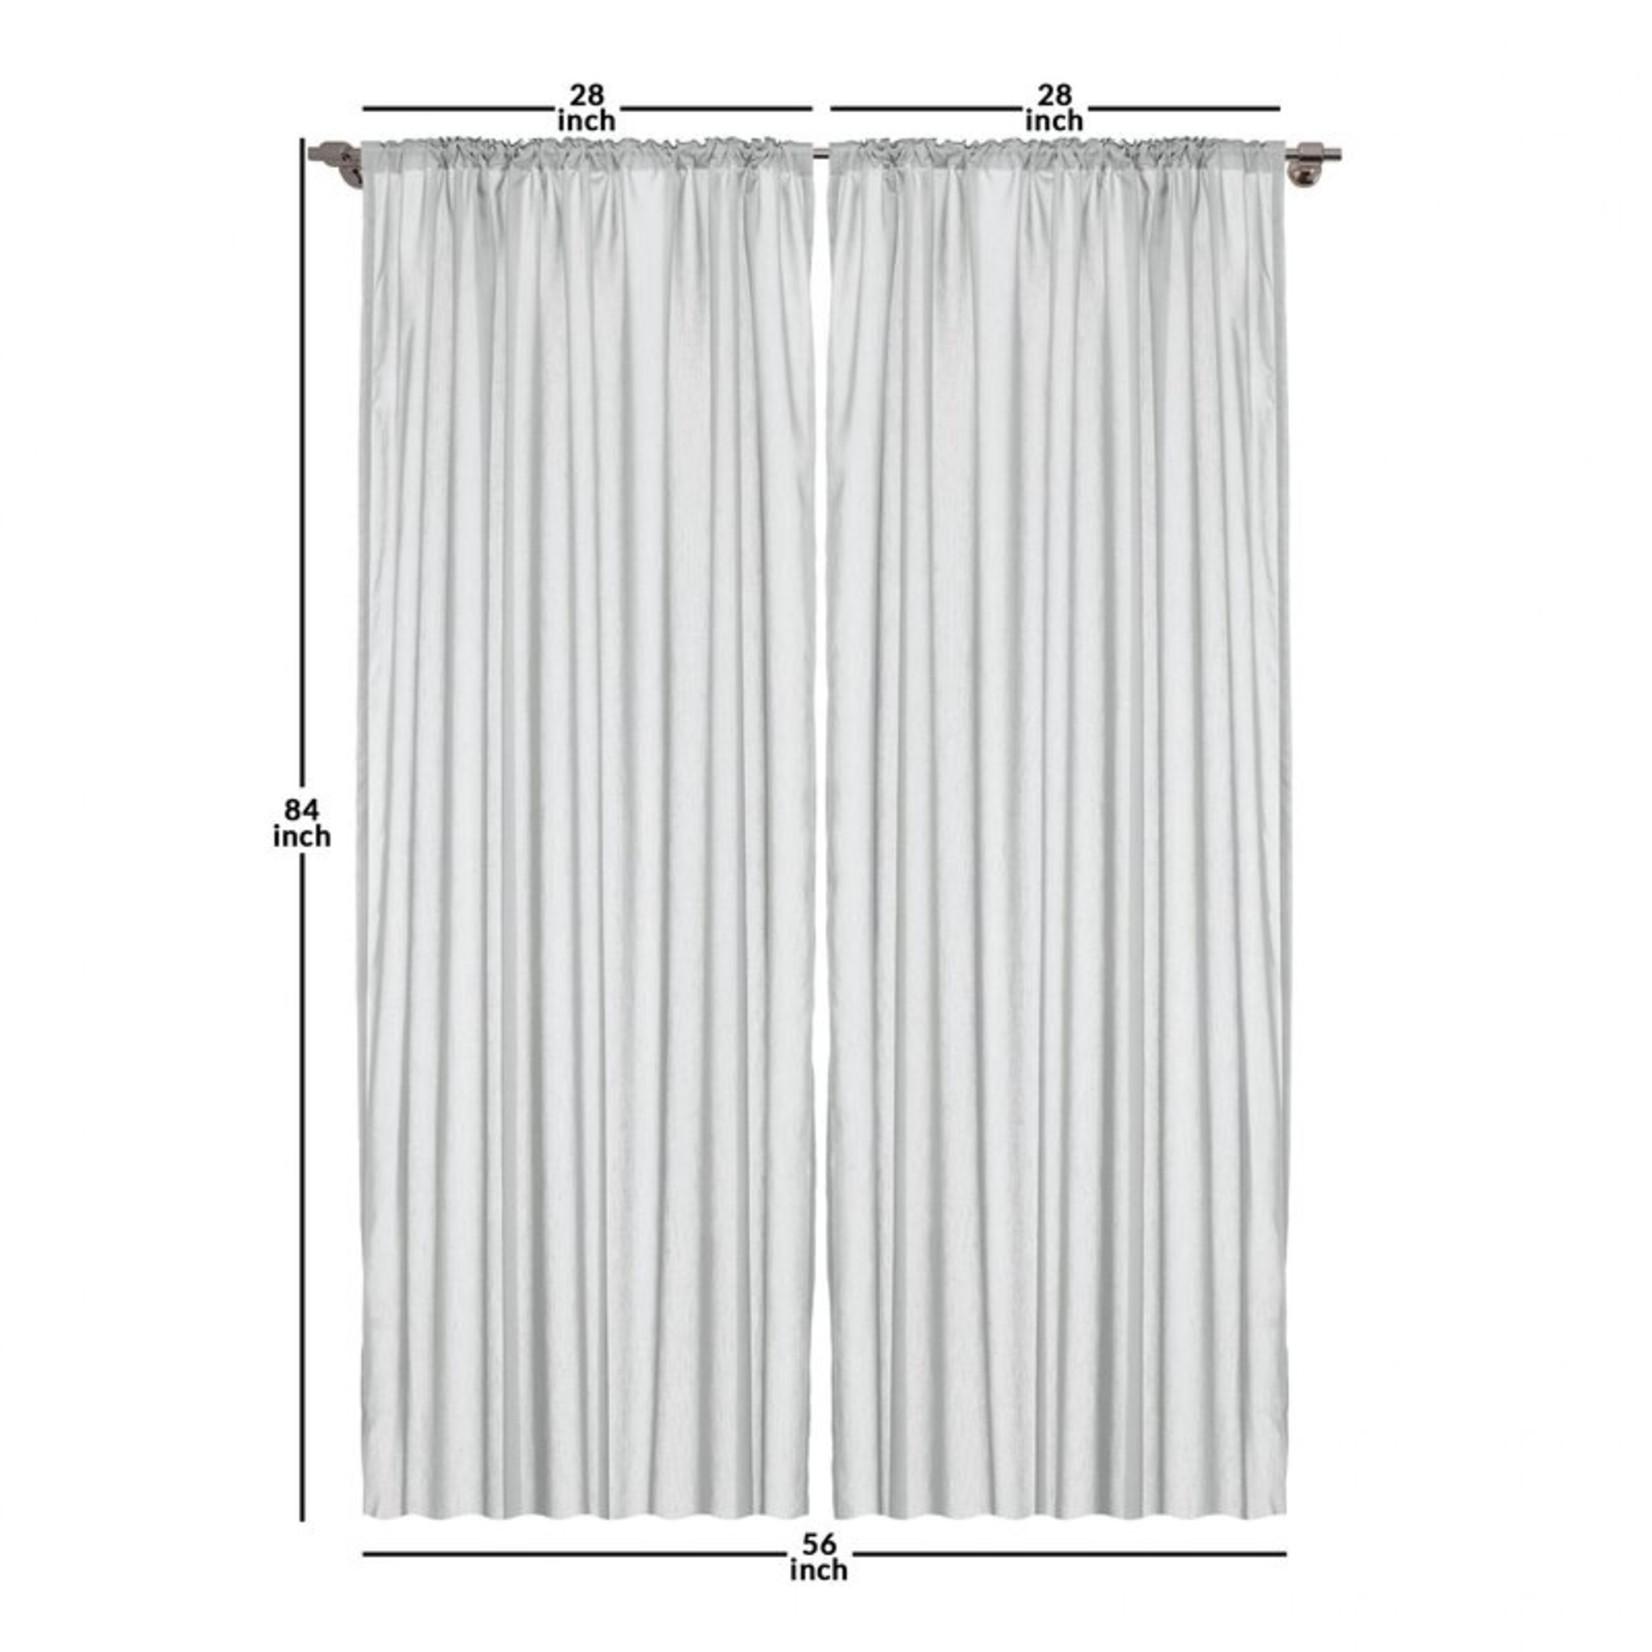 "*28"" x 84"" - Abstract Room Darkening Rod Pocket Curtain Panels - Set of 2"